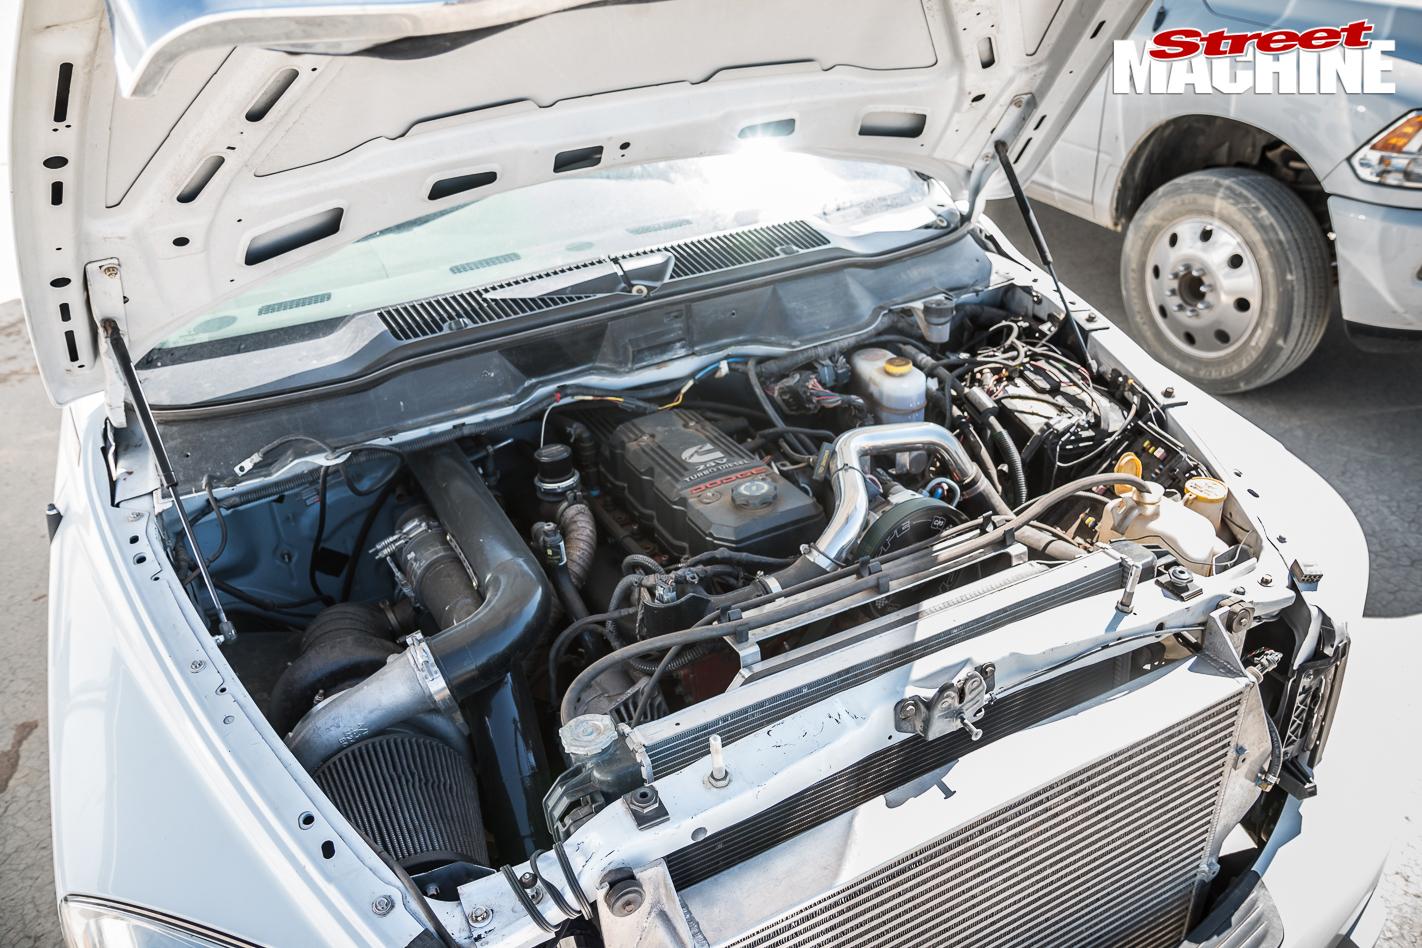 Dodge -Ram -El -Mirage -Salty -Box -Racing -engine -0461